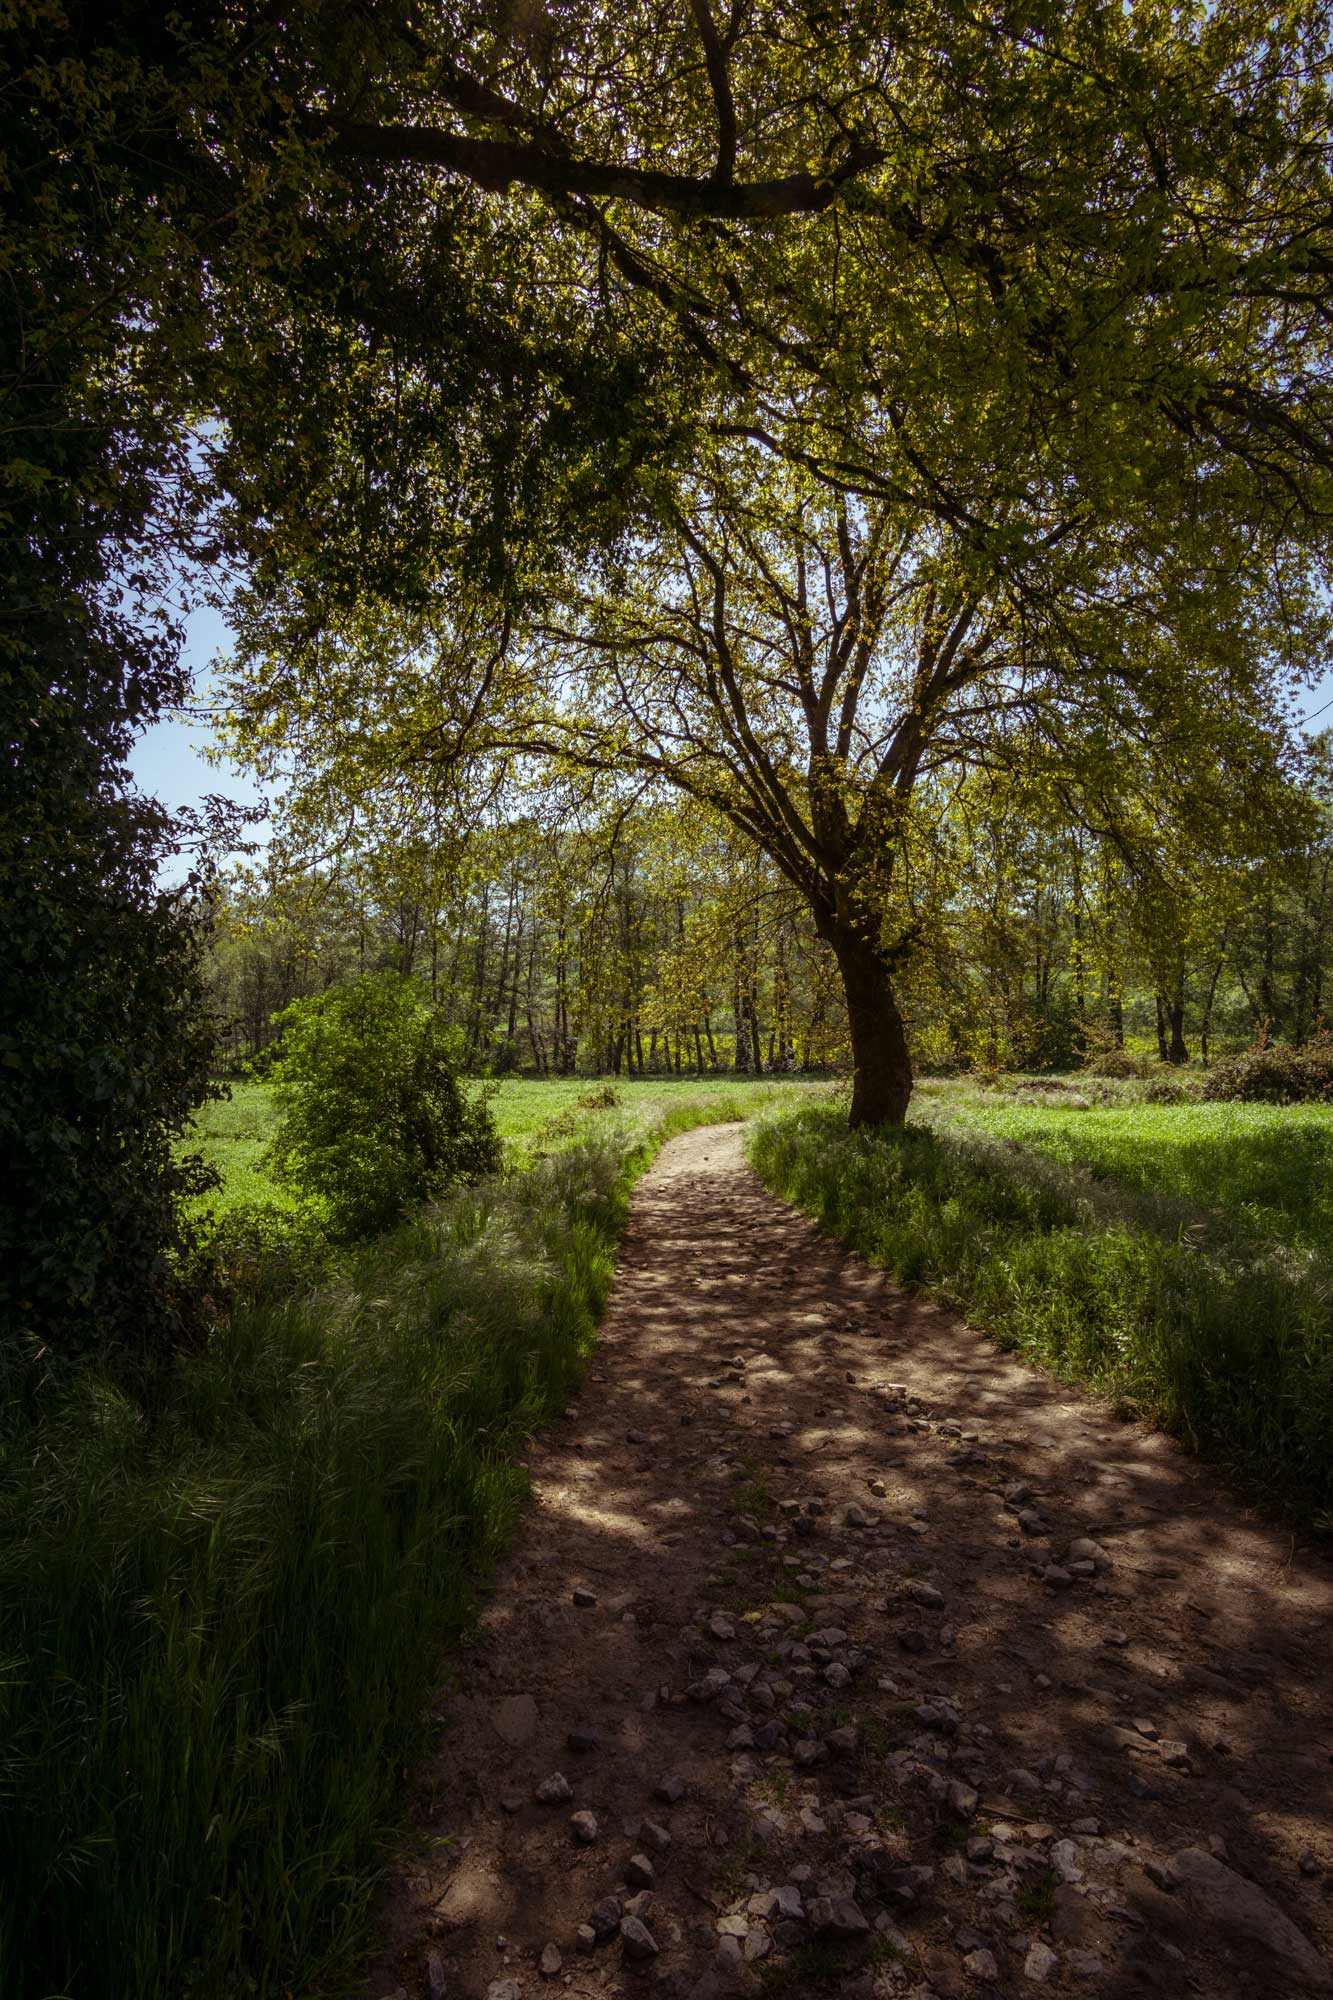 The Pilgrim's way